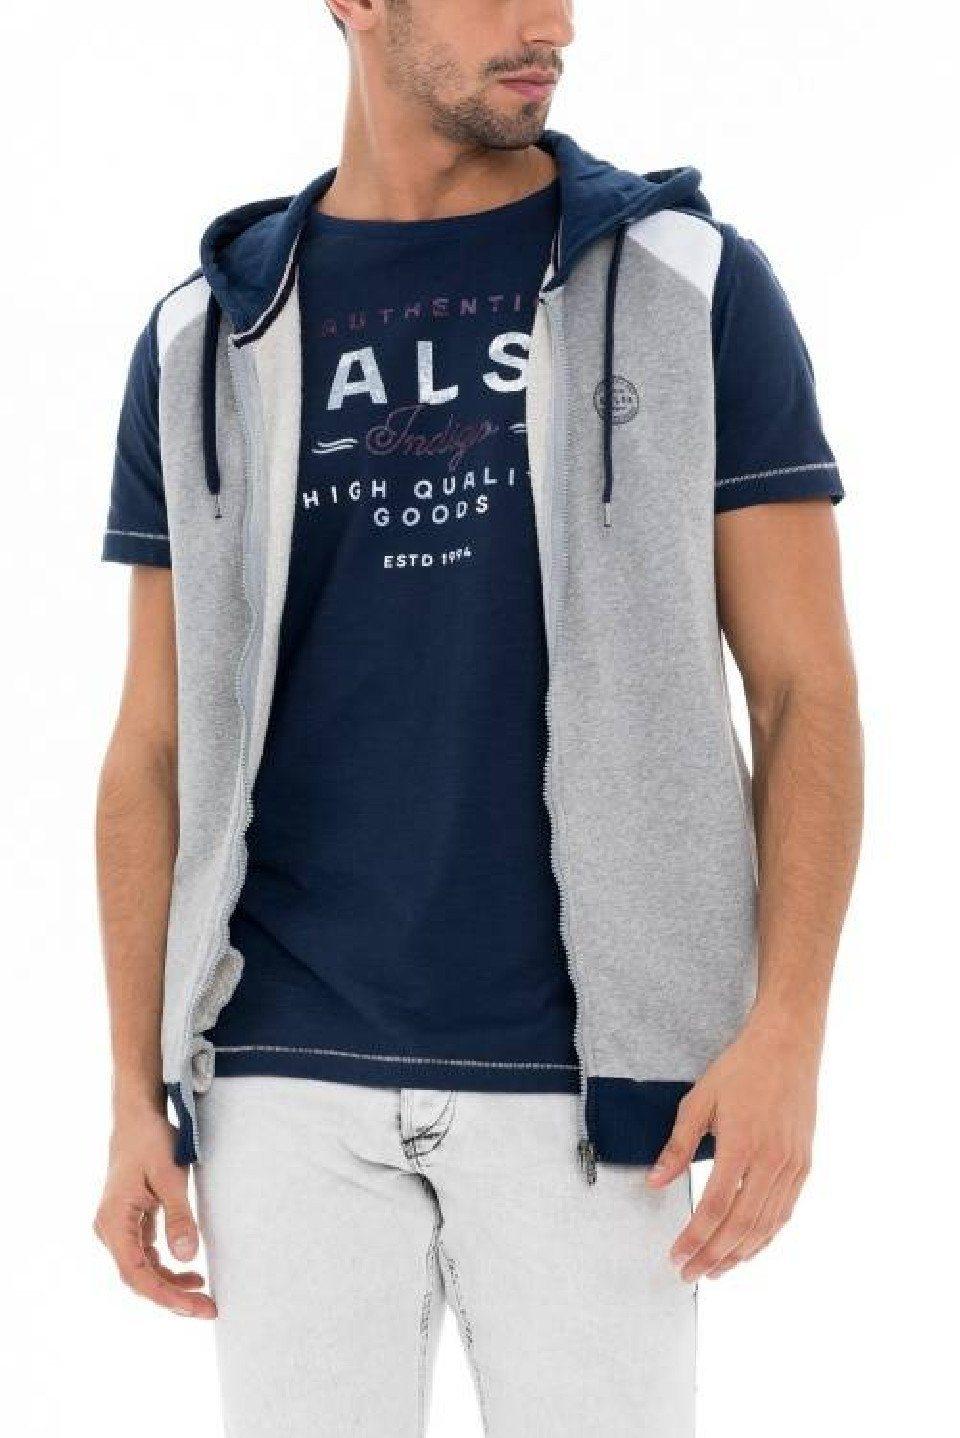 Herren salsa jeans Langarm T-Shirt PALM BEACH blau, grau, grün, schwarz | 05604562747479